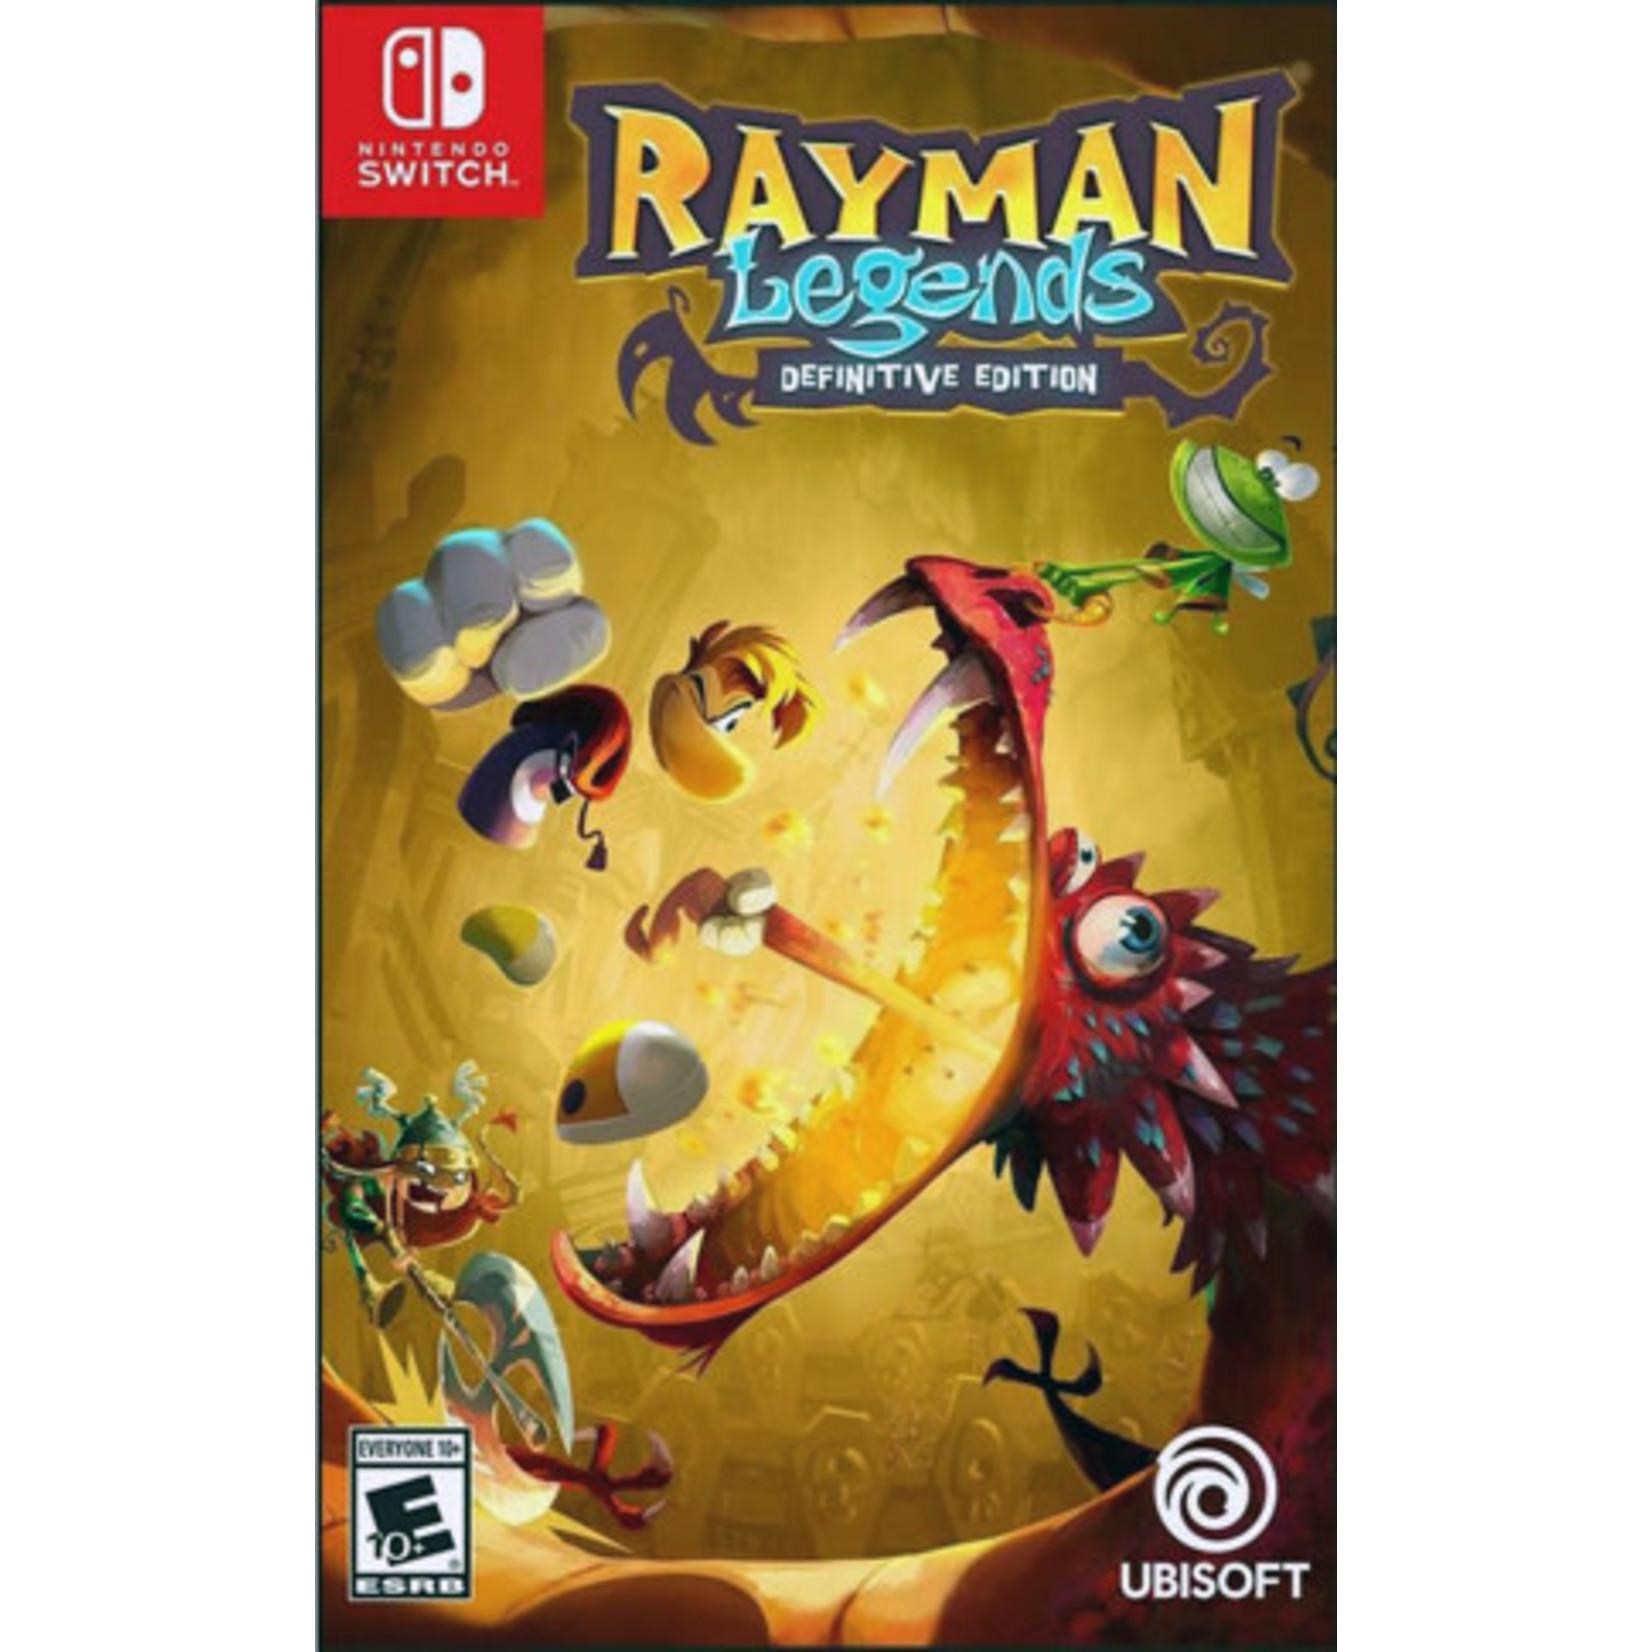 SWITCH-Rayman Legends Definitive Edition